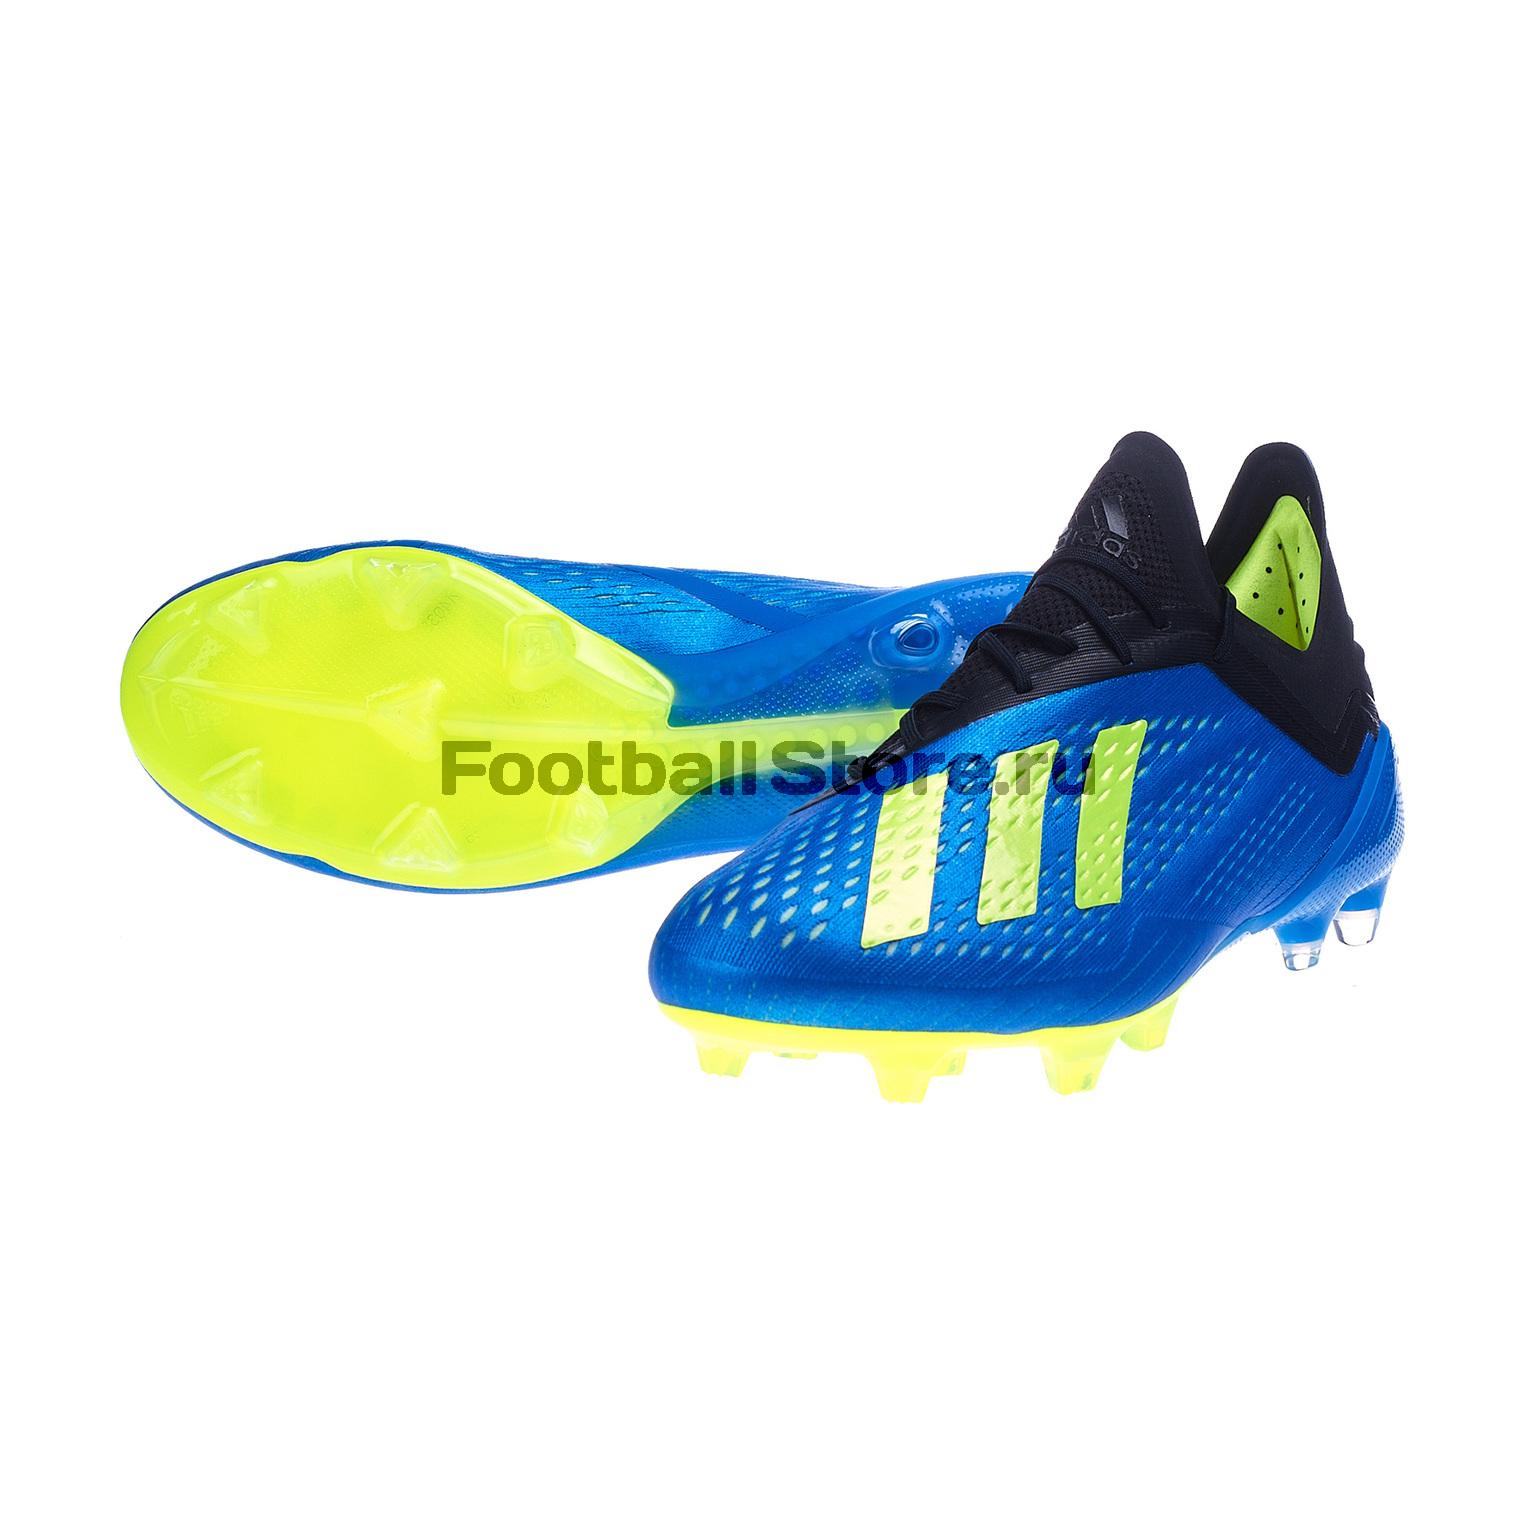 Бутсы Adidas X 18.1 FG CM8365 бутсы adidas x 17 1 fg bb6353